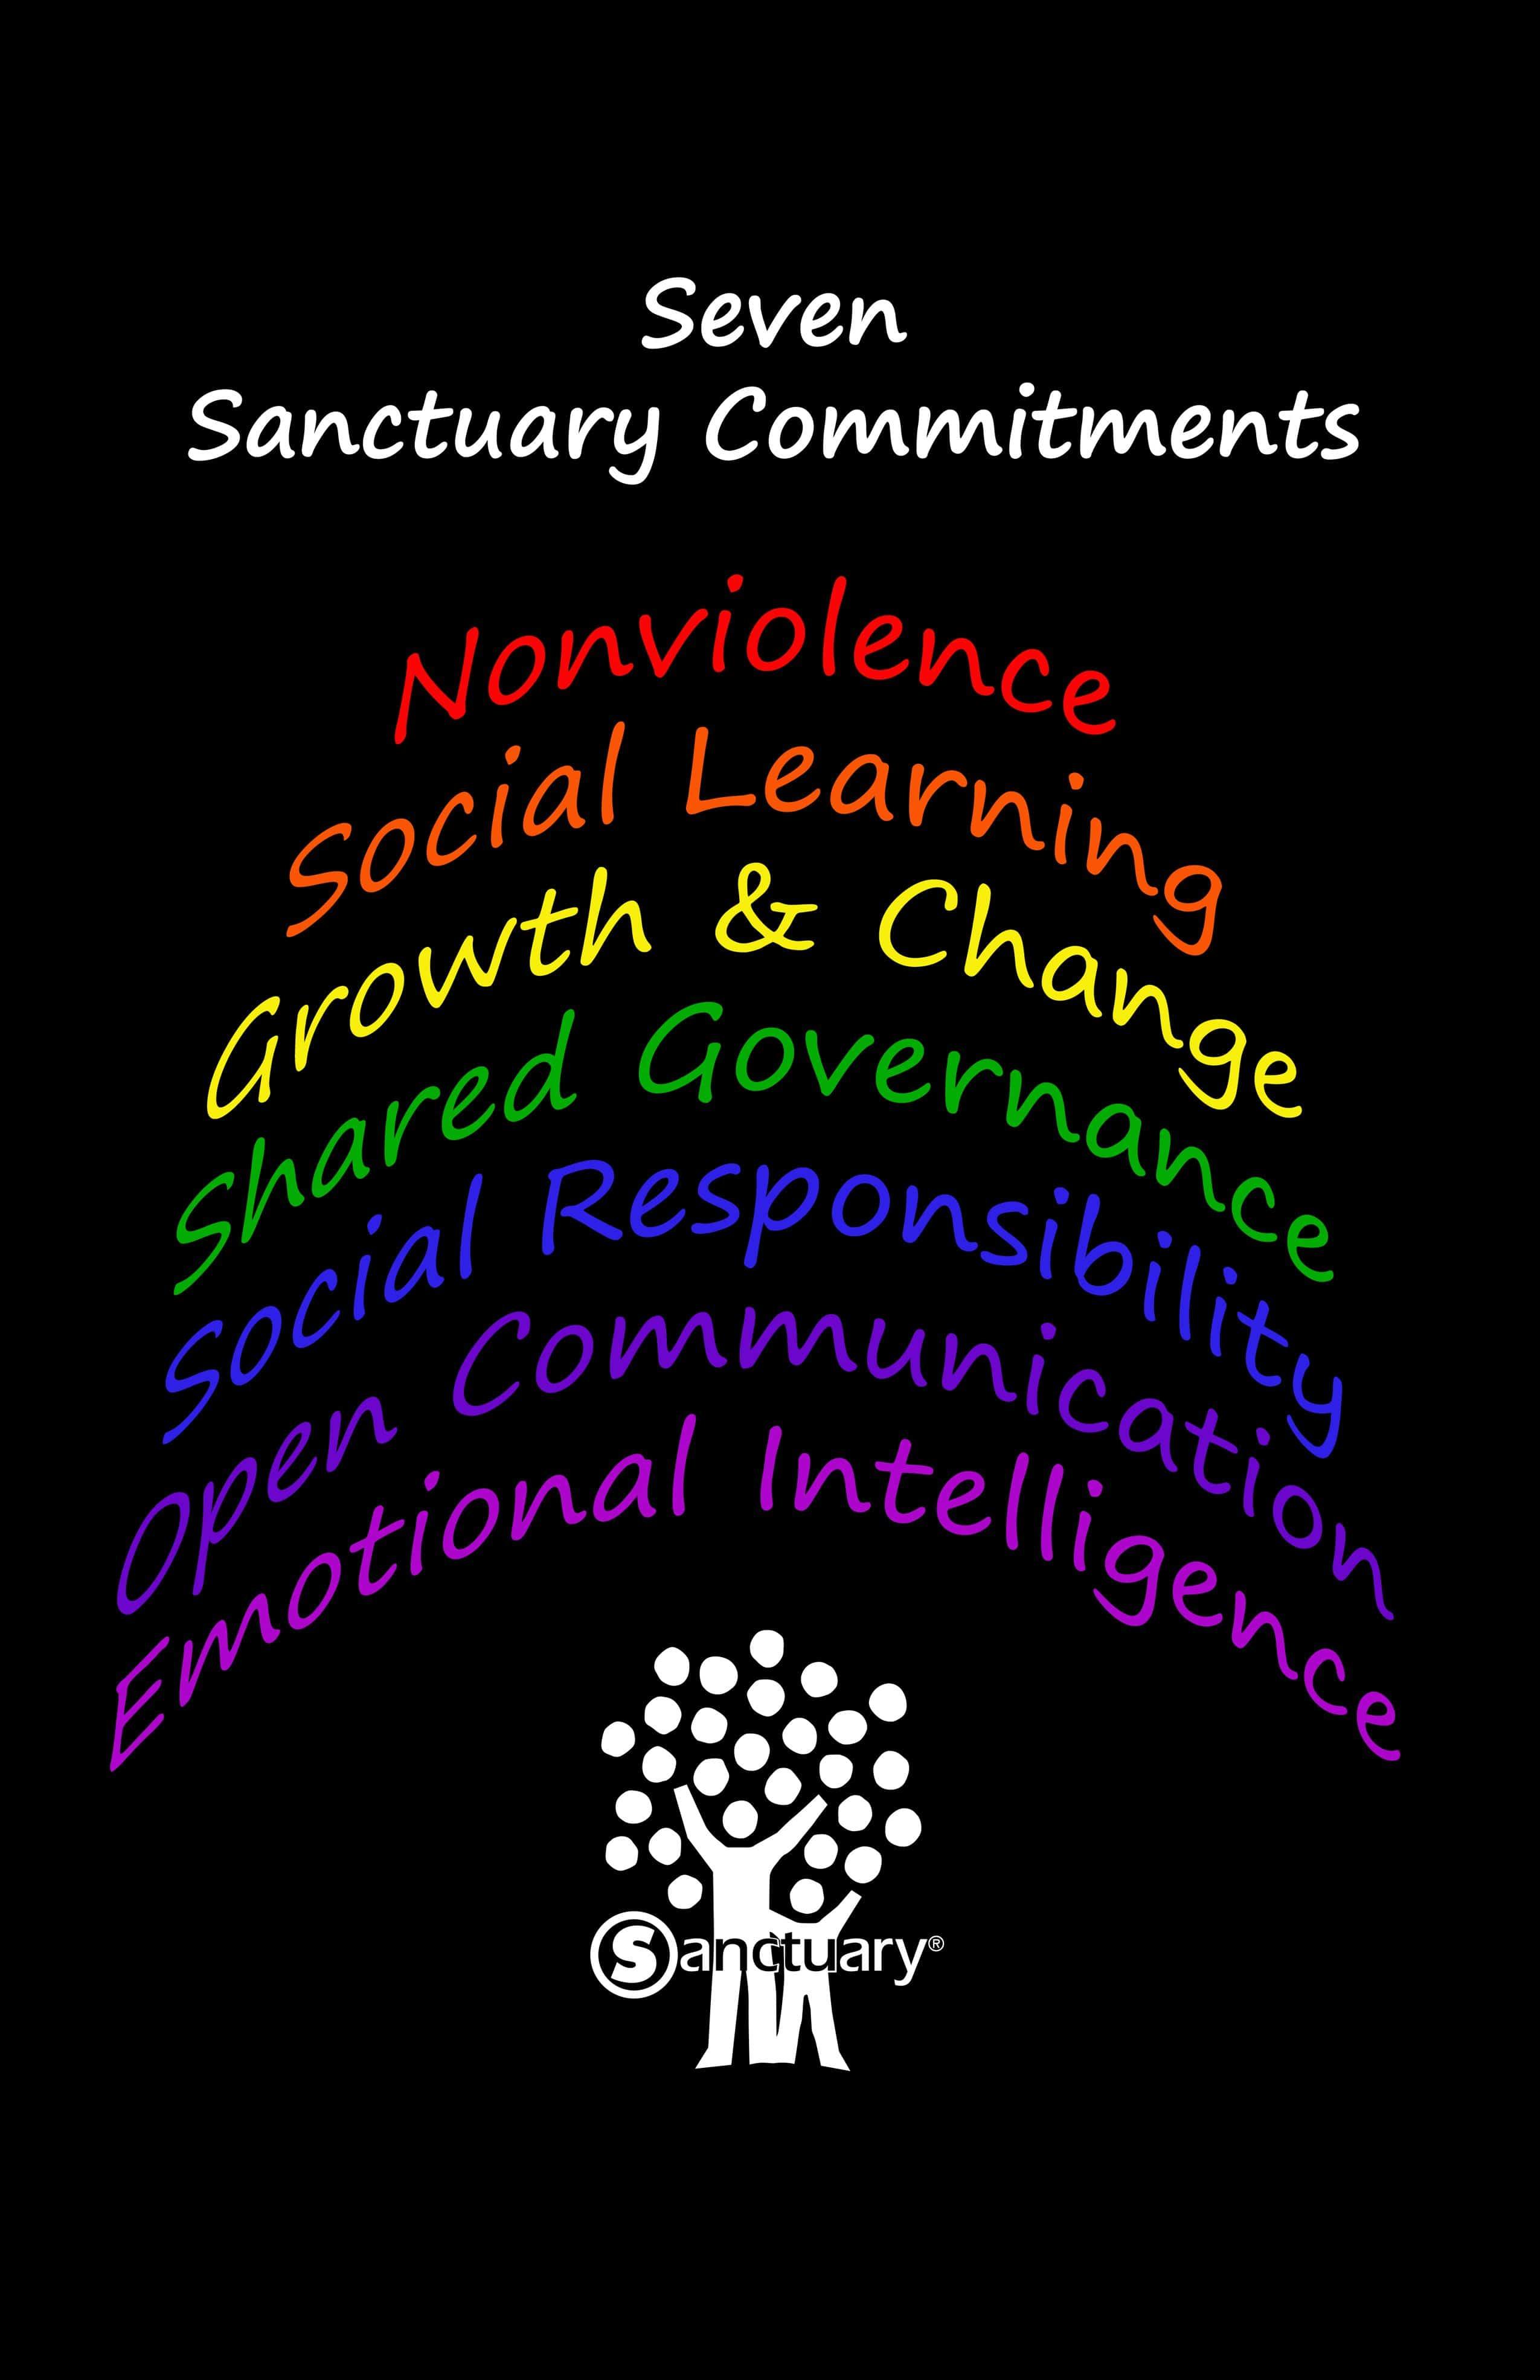 Sanctuary Trauma Informed Care Self Care Safety